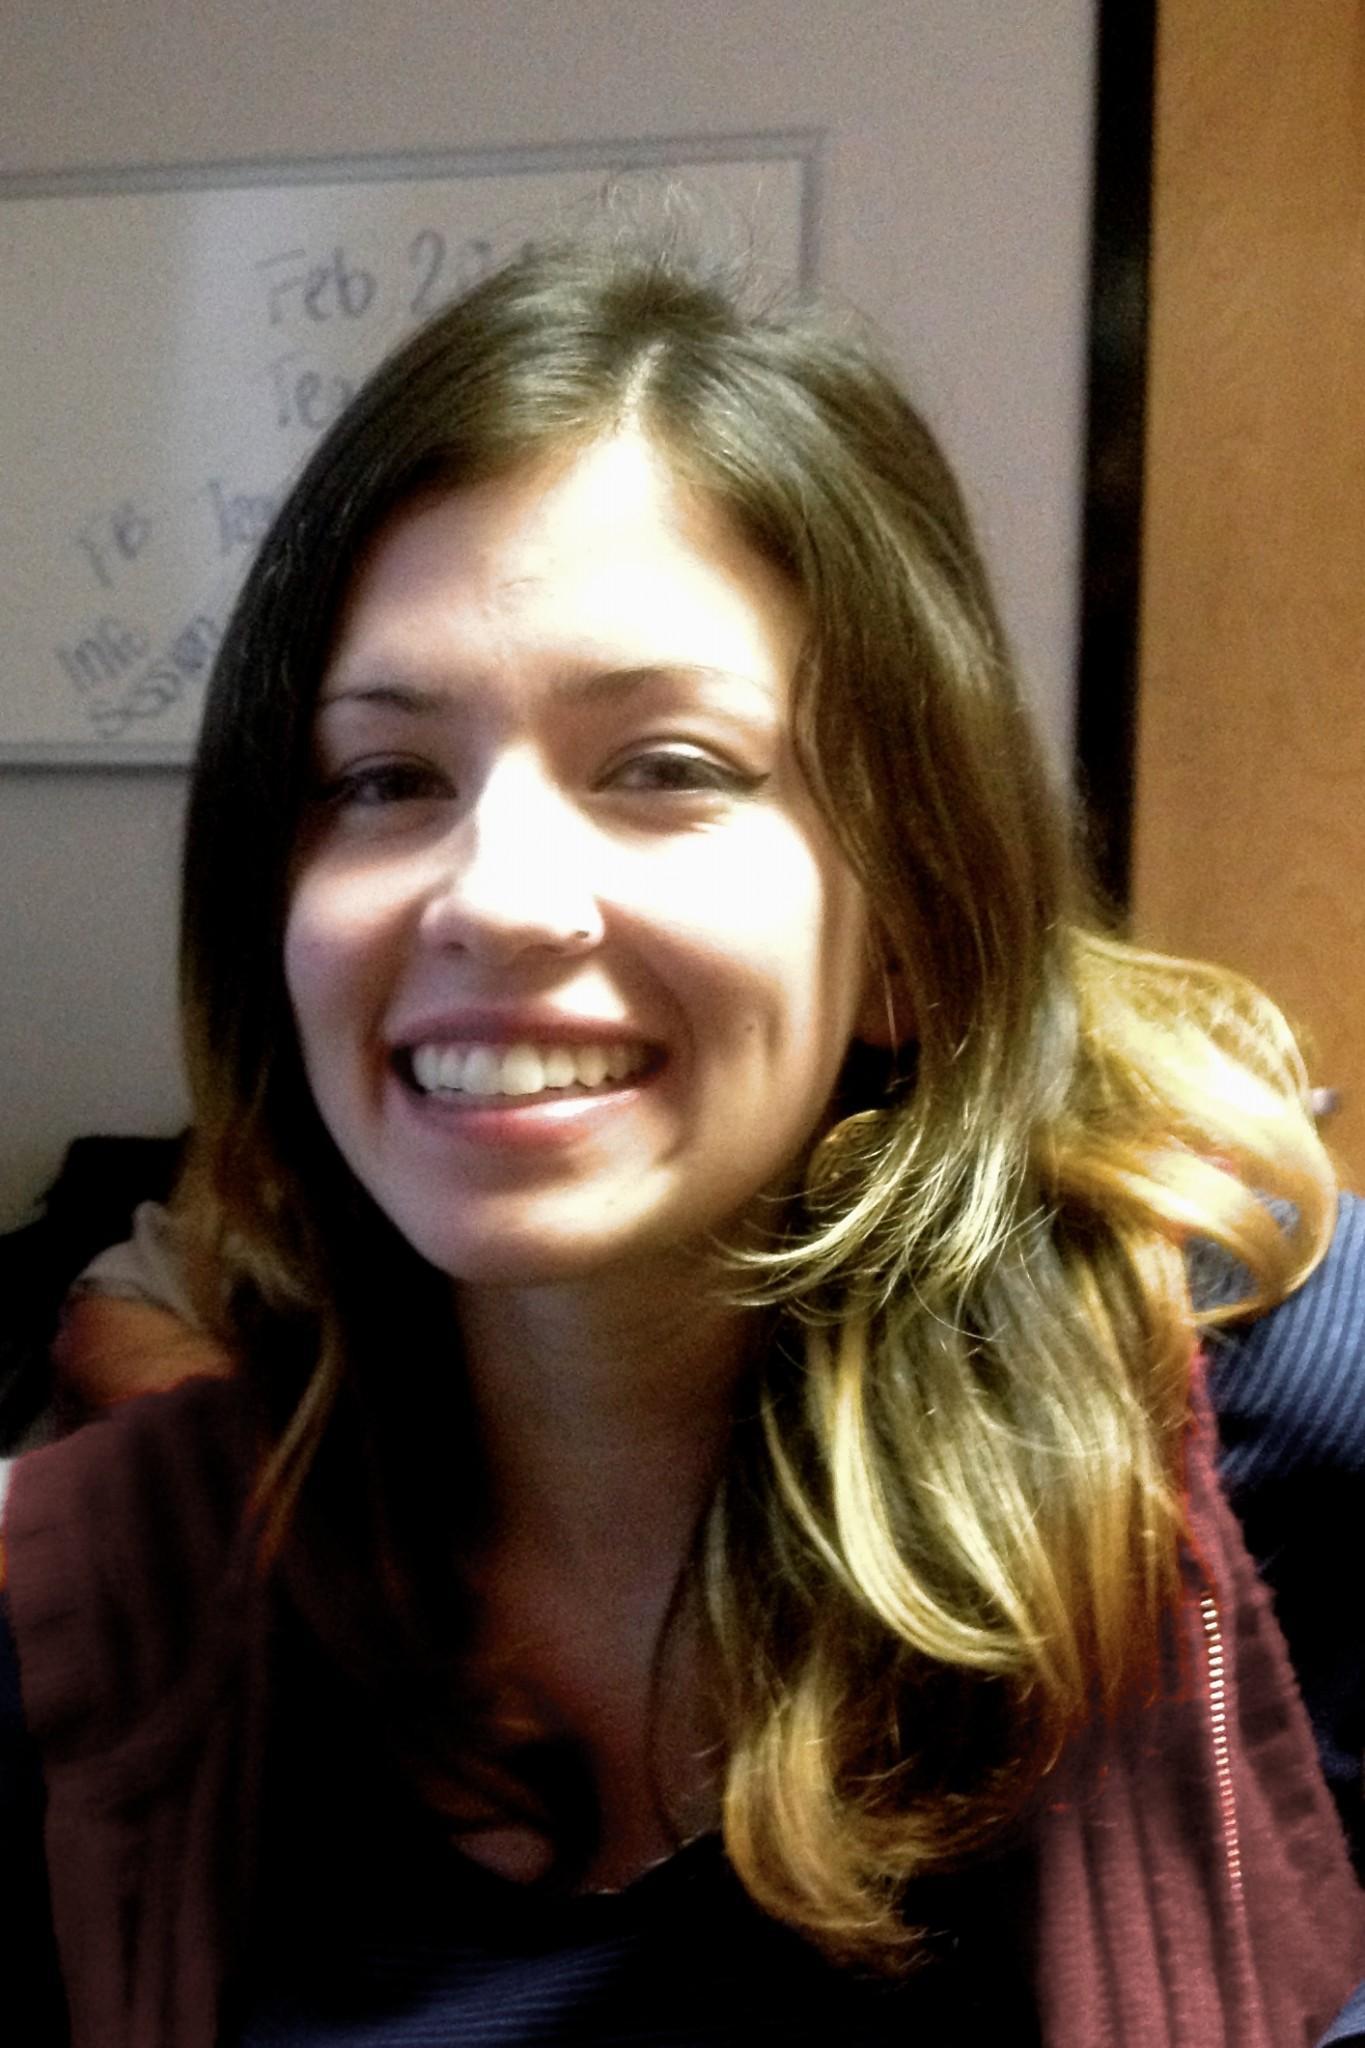 Cassandra Buitron, junior English major, questions Facebook's new gender options.